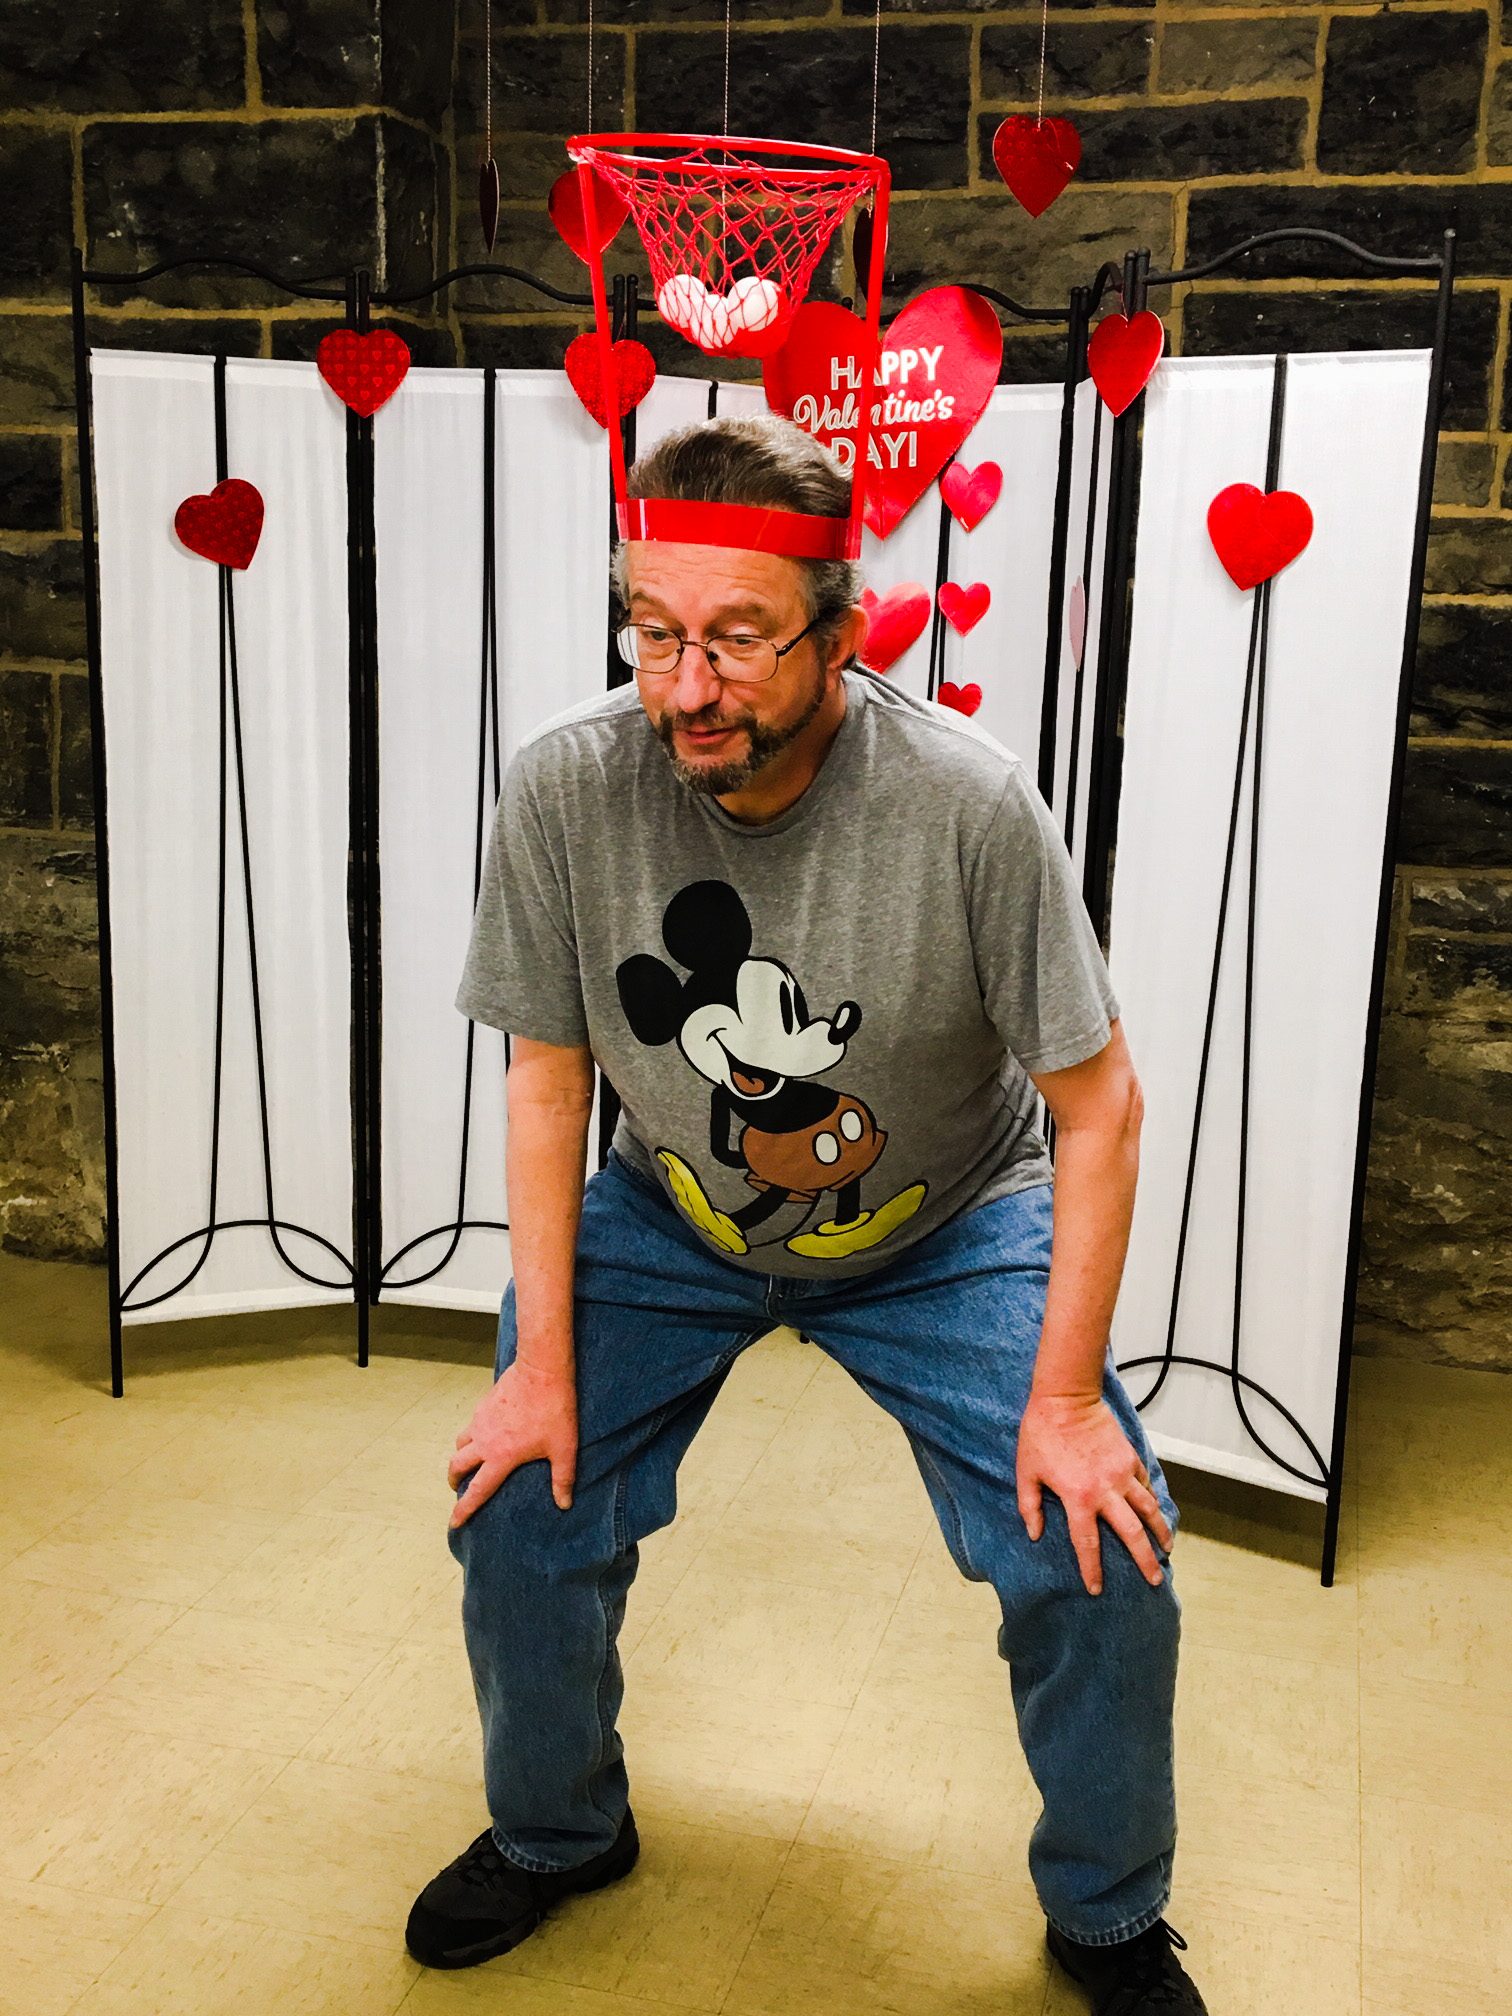 Emmanuel Christian Church - We Love Fun Day! Sunday February 10, 2019